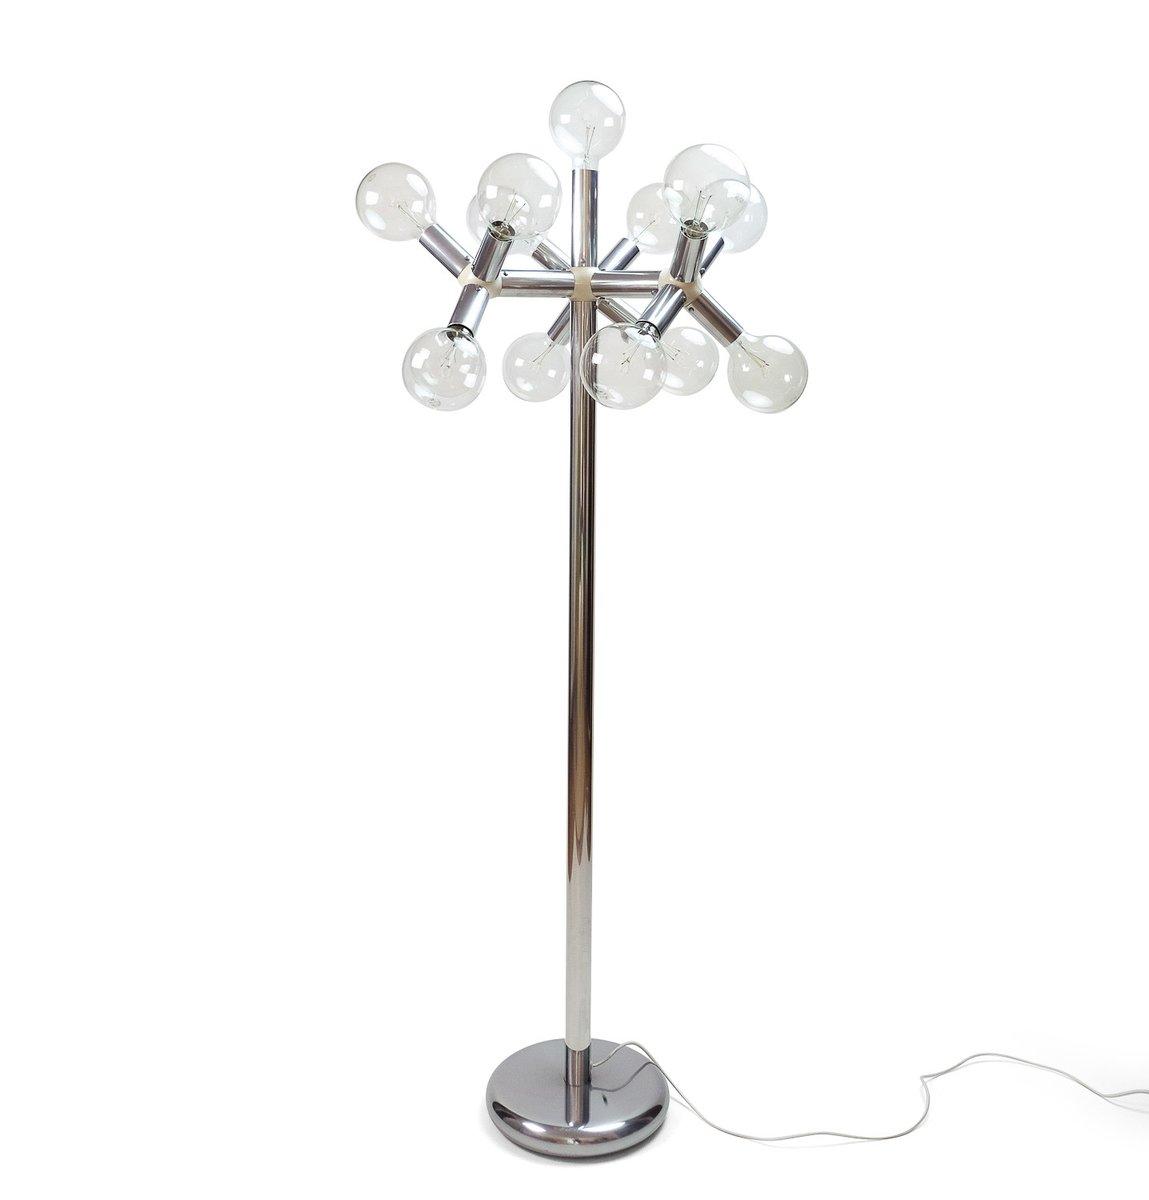 Atomic Floor Lamp by Trix Haussmann for Swiss Lamps International, 197...